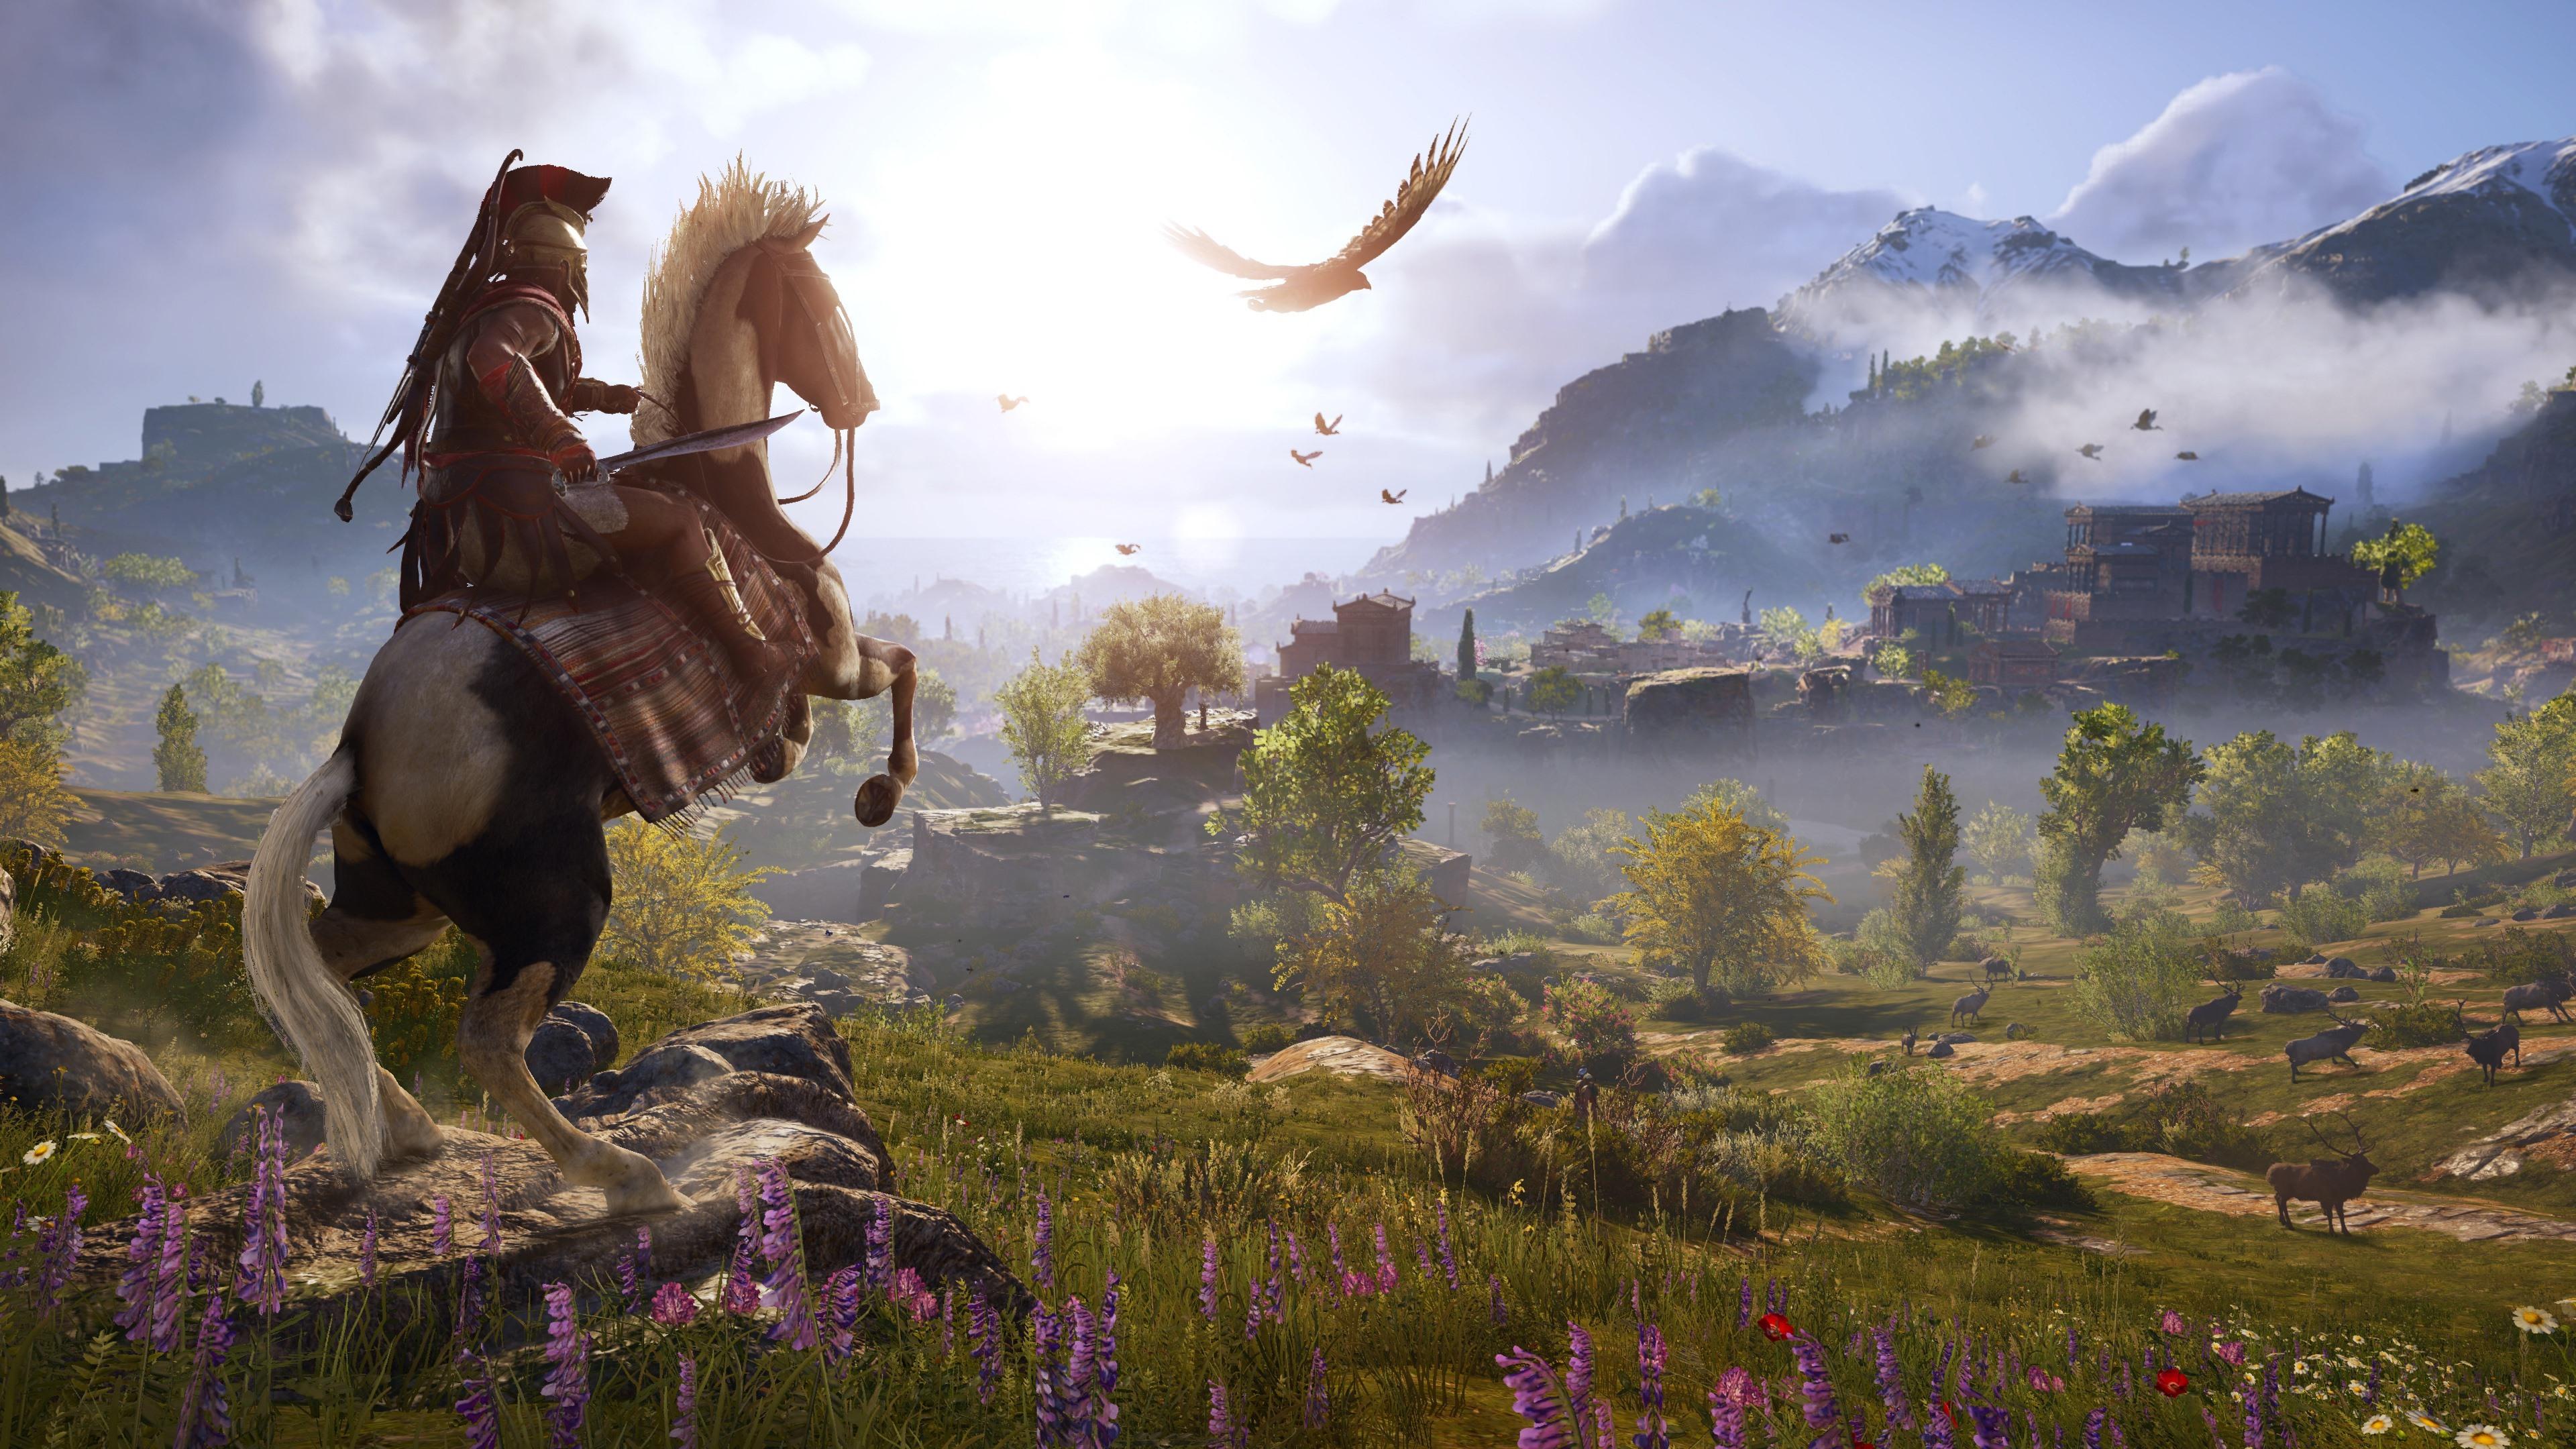 Wallpaper Assassin's Creed: Odyssey, Horse, Village